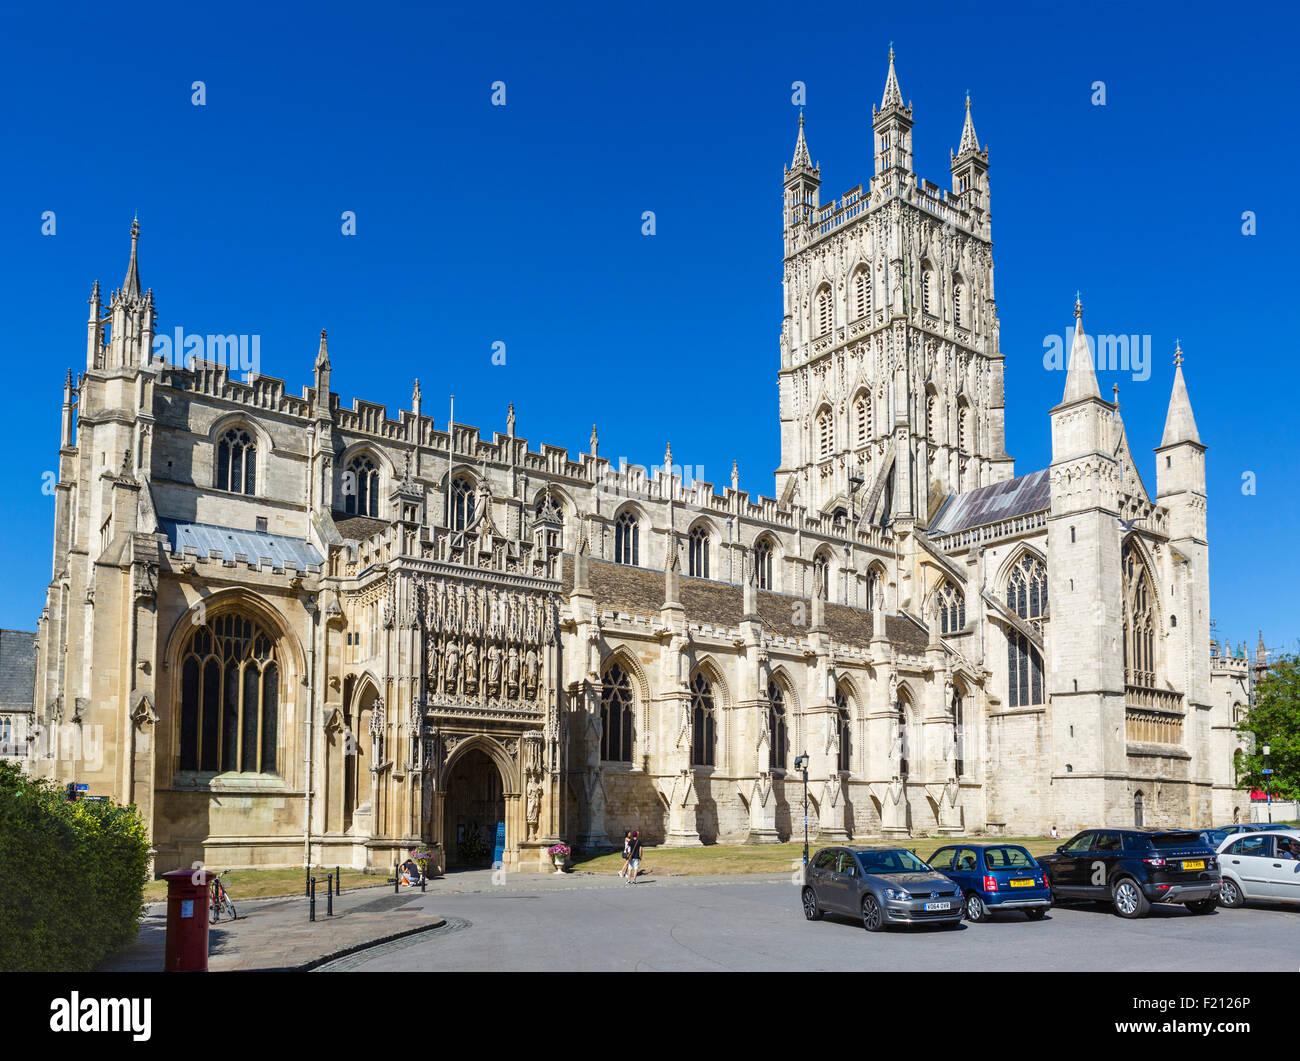 Gloucester Cathedral, Gloucester, Gloucestershire, England, UK - Stock Image